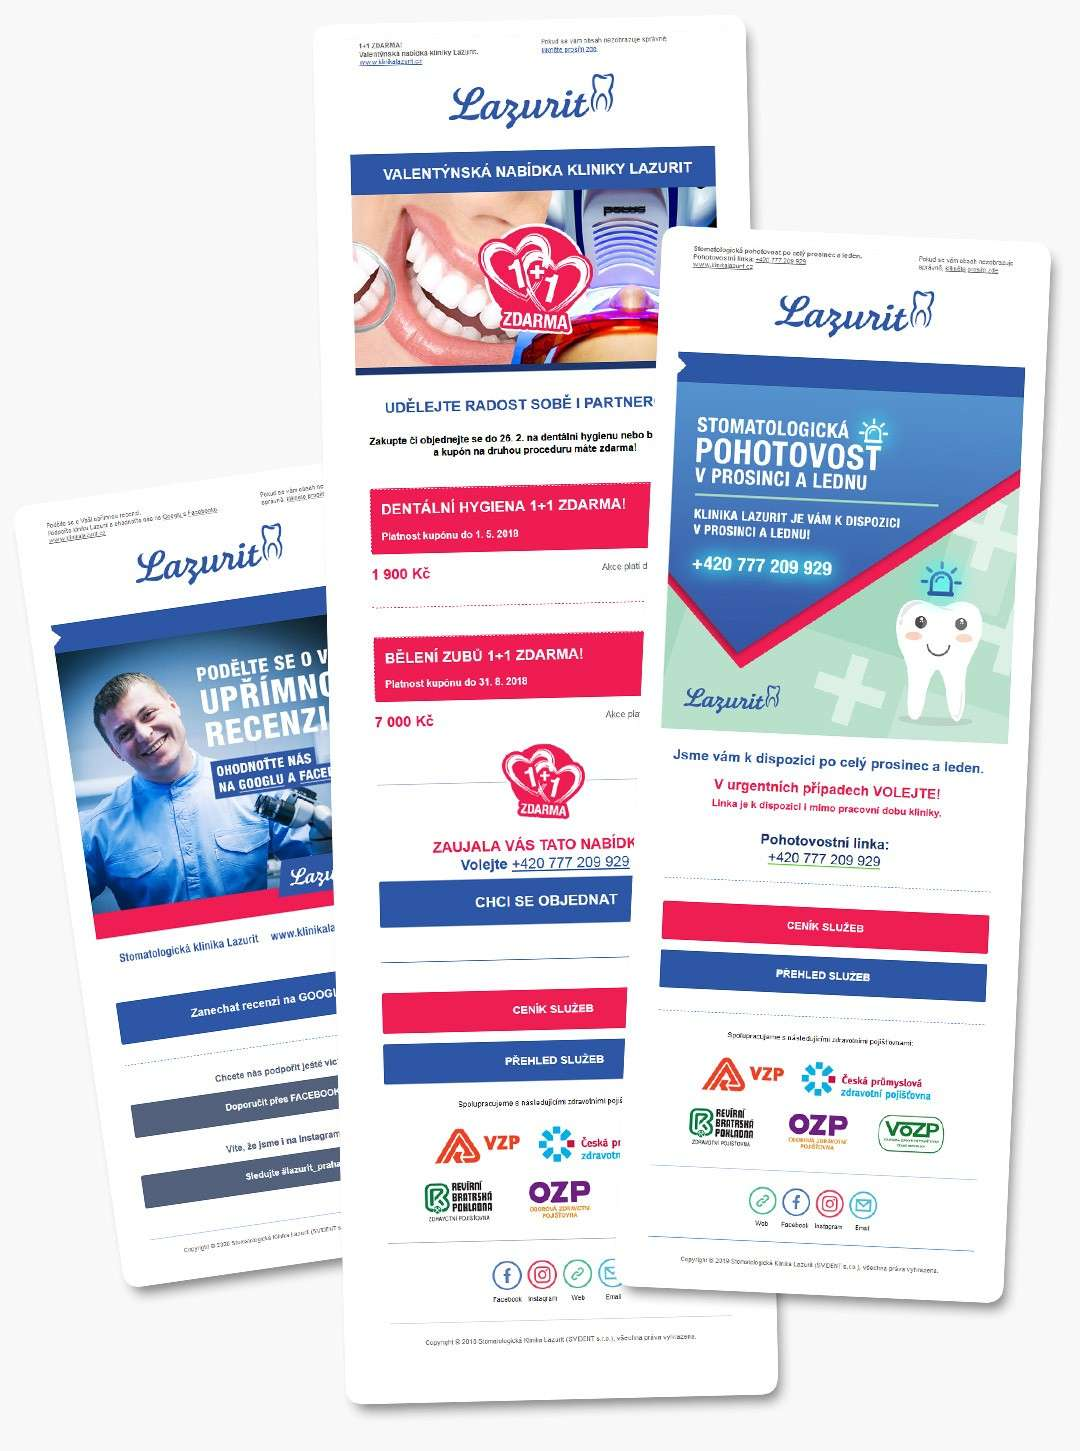 clubadvisor_reference_klinika-lazurit_crm_newsletter